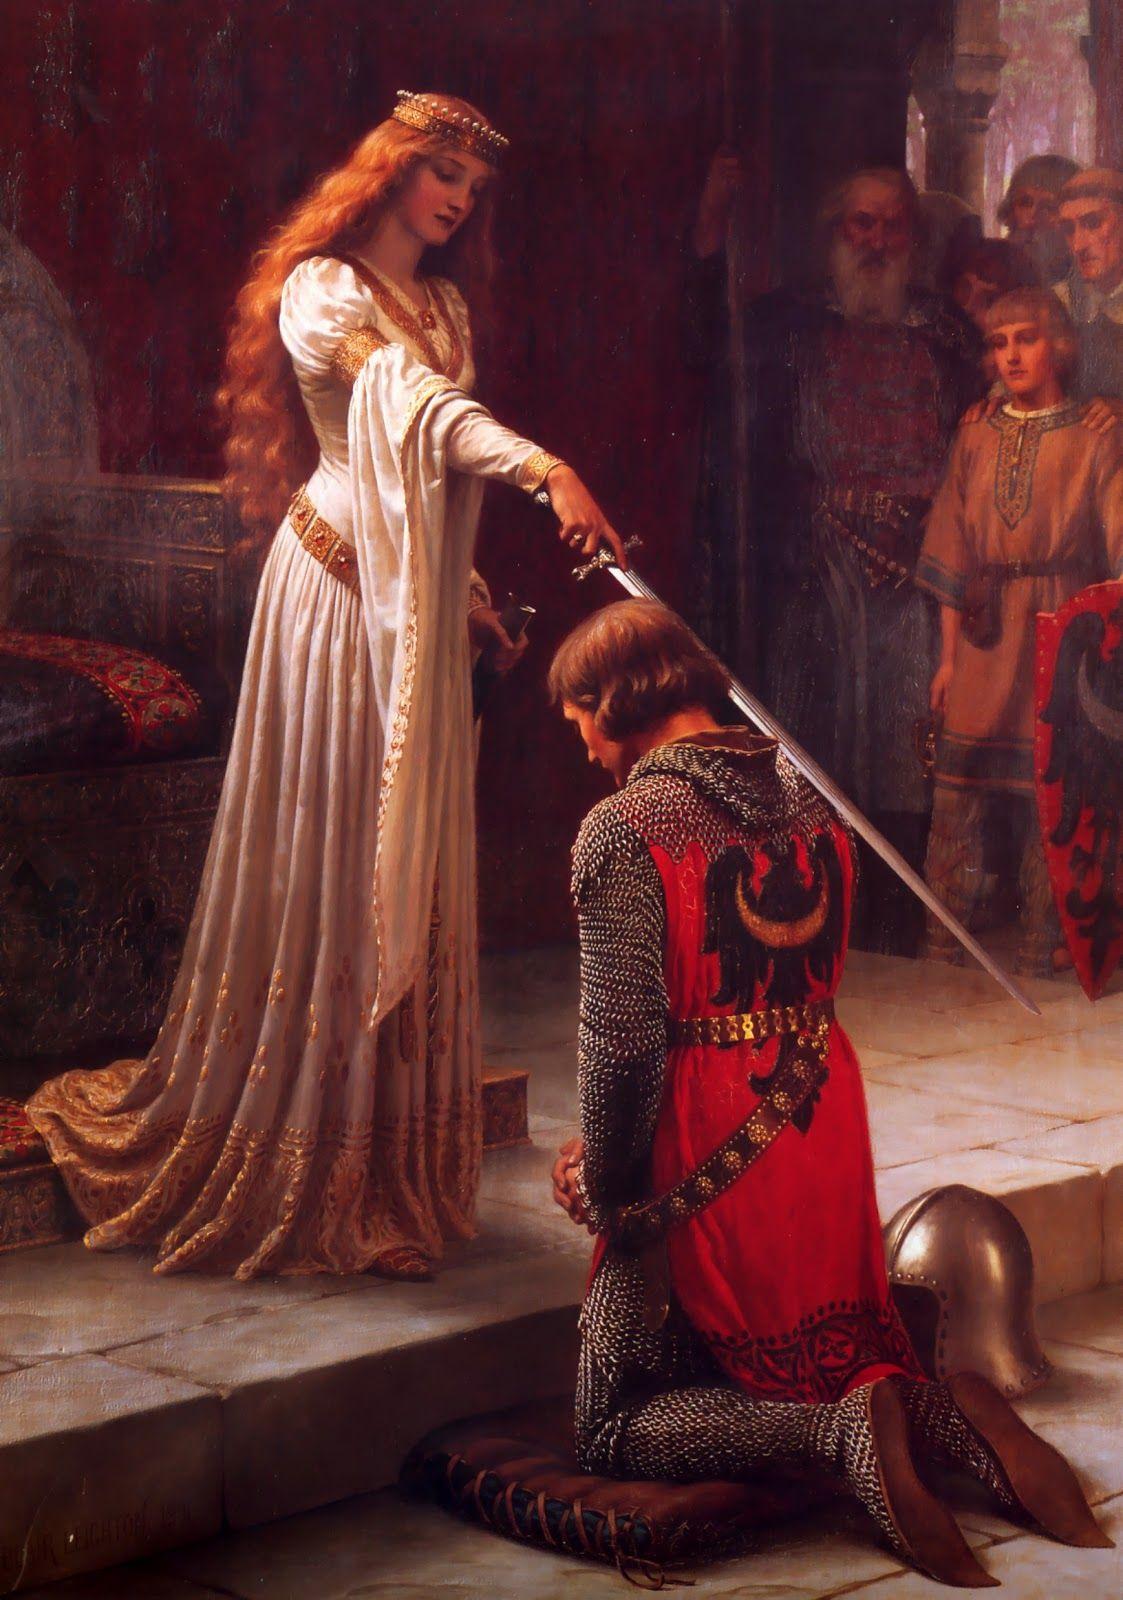 Edmund Blair Leighton (1852-1922) | Art de la renaissance, Préraphaélites, Robe médiévale